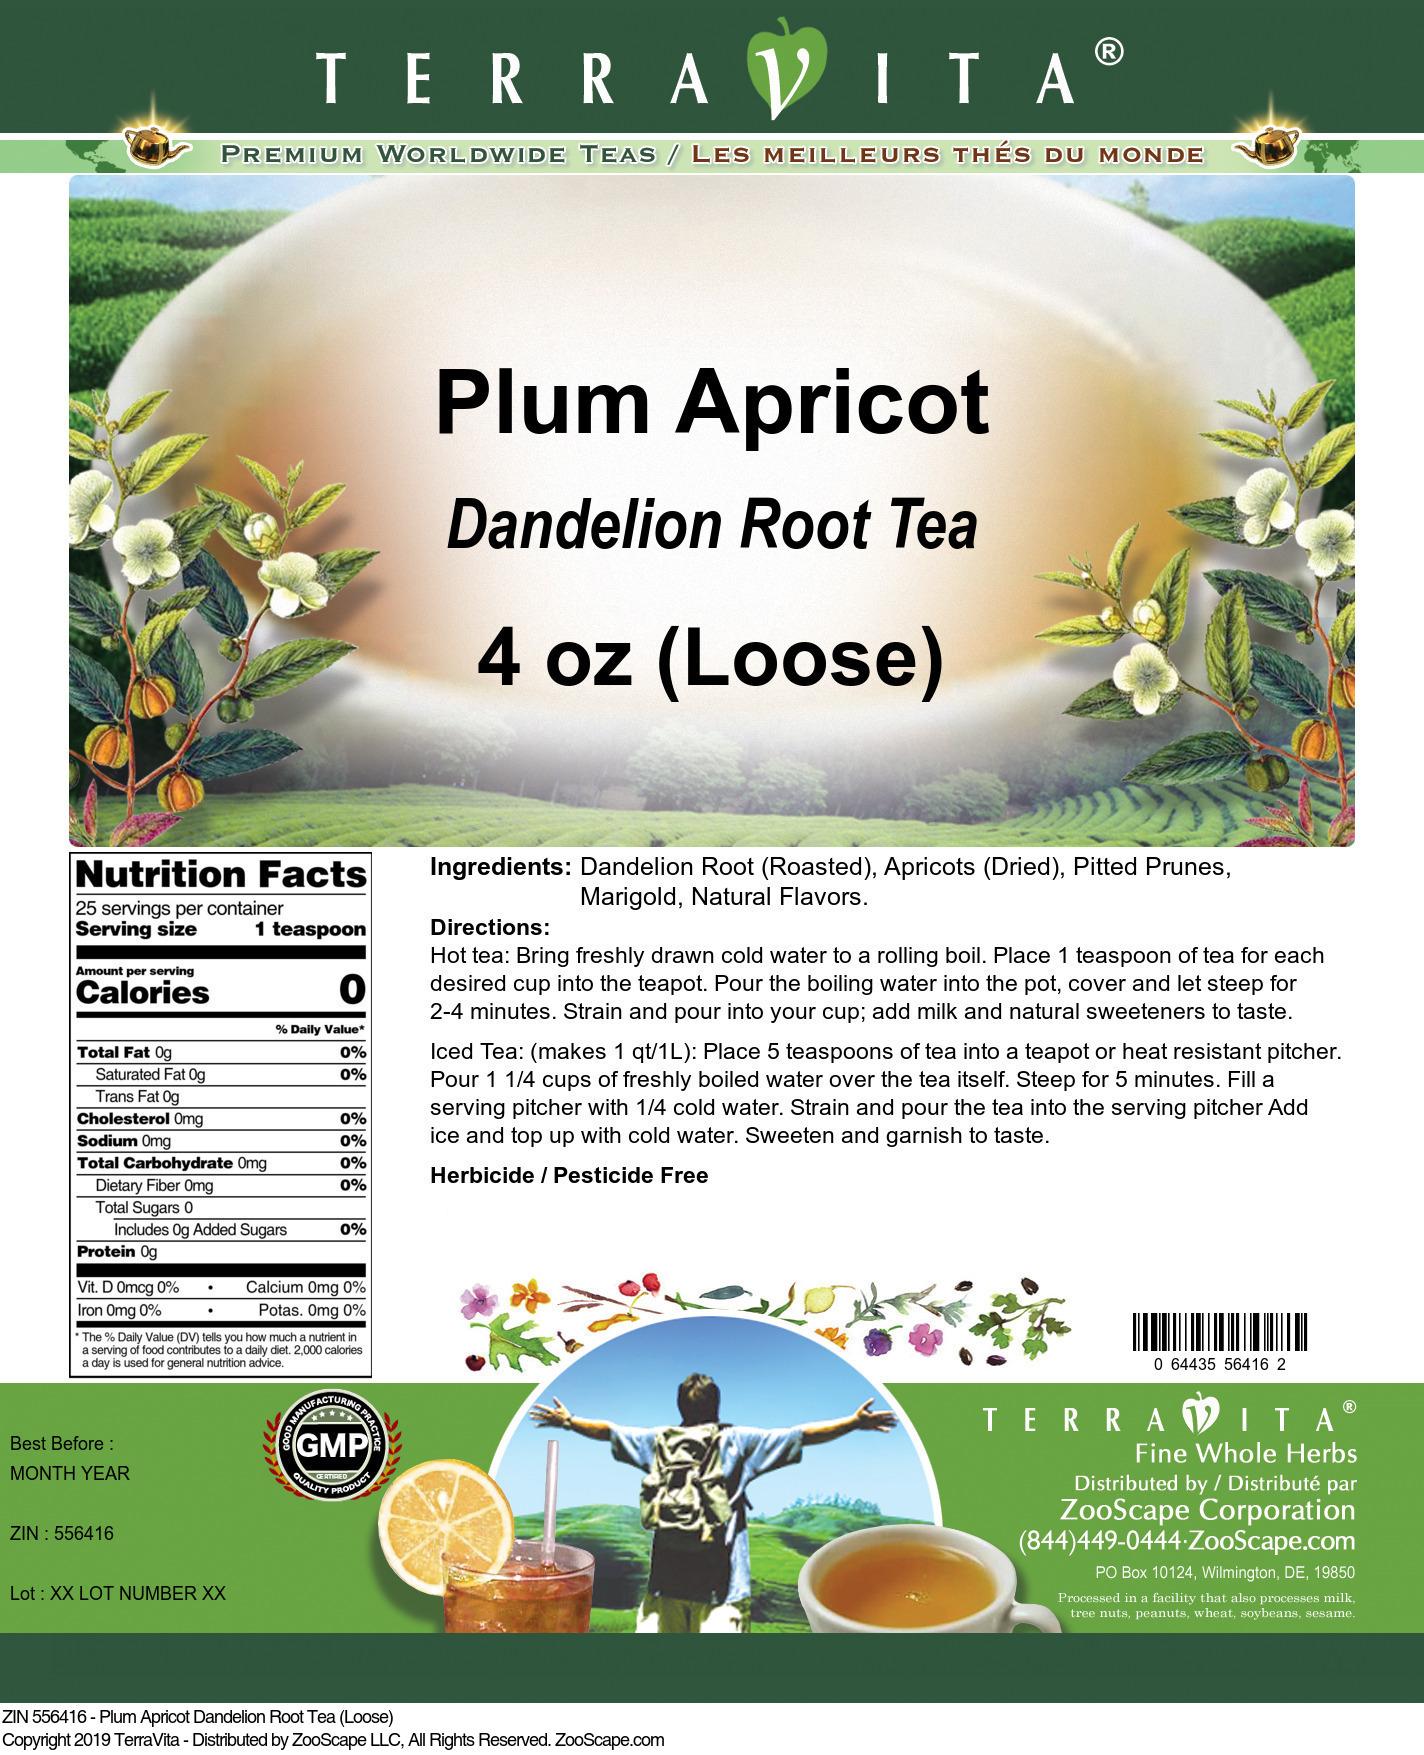 Plum Apricot Dandelion Root Tea (Loose)